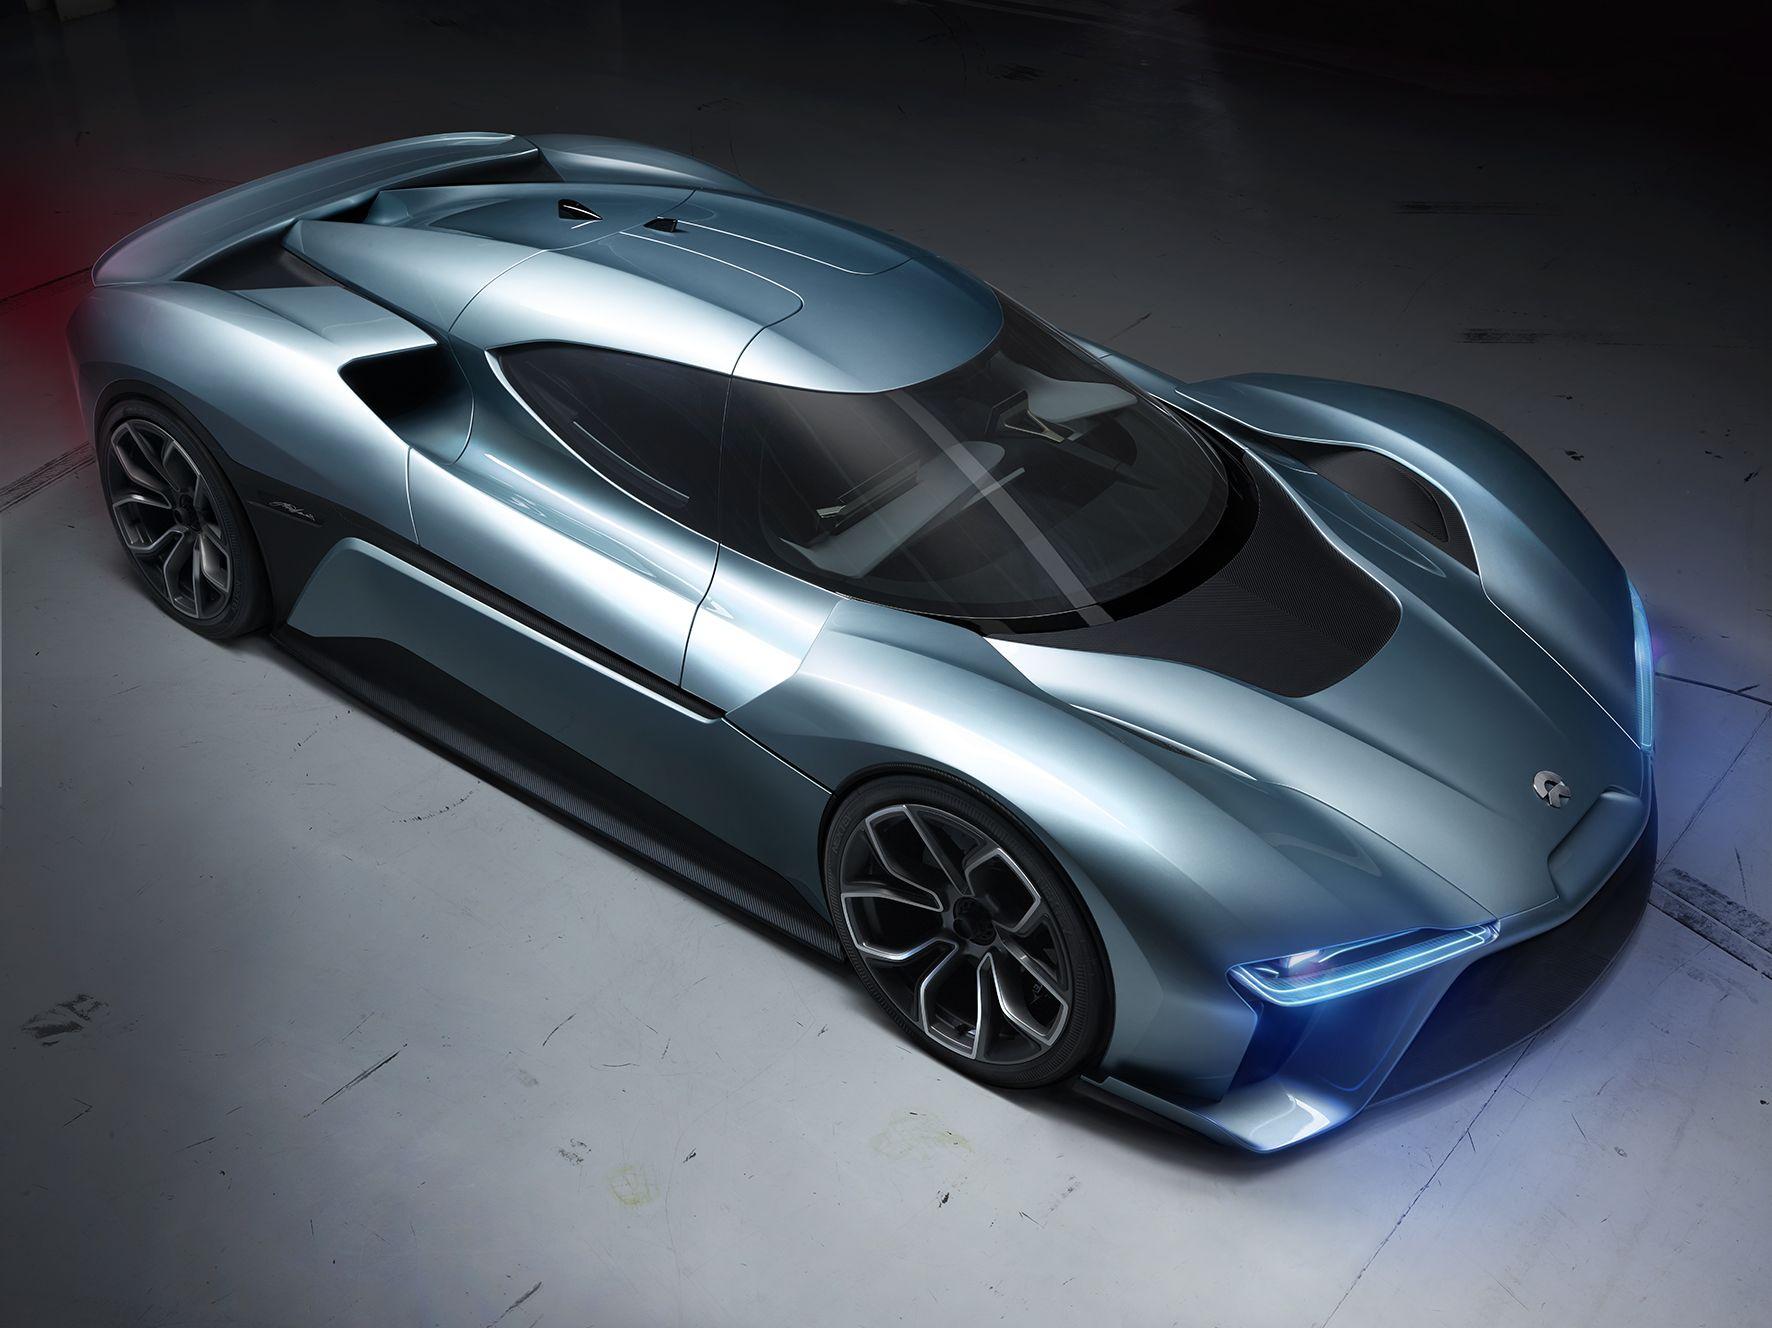 The Nio Brand And The Nio Ep9 Electric Supercar Super Cars Hybrid Car Futuristic Cars